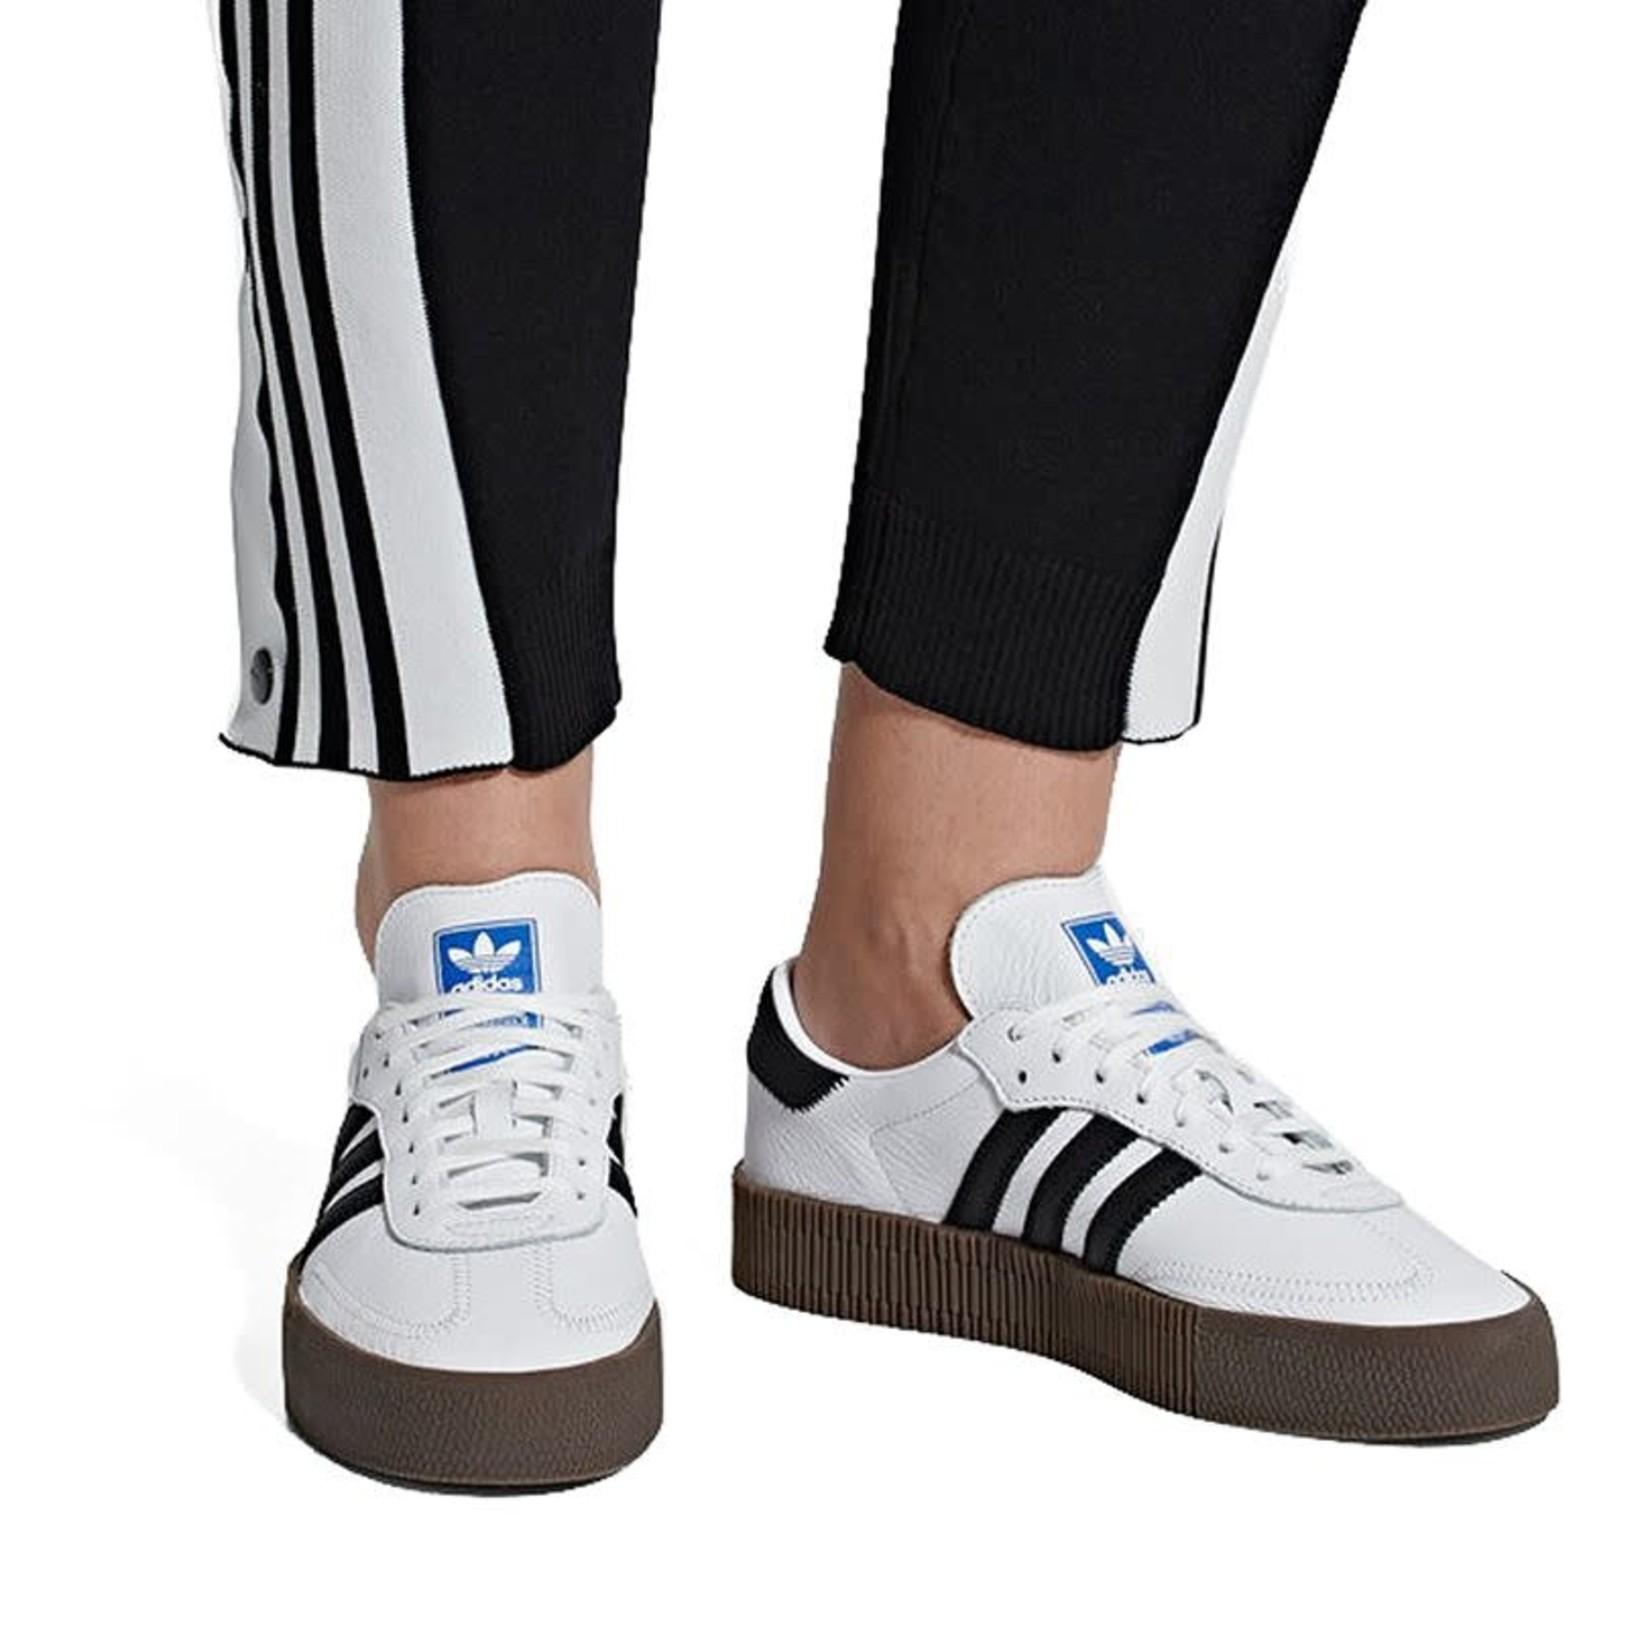 Adidas adidas Footwear : Sambarose W Shoes